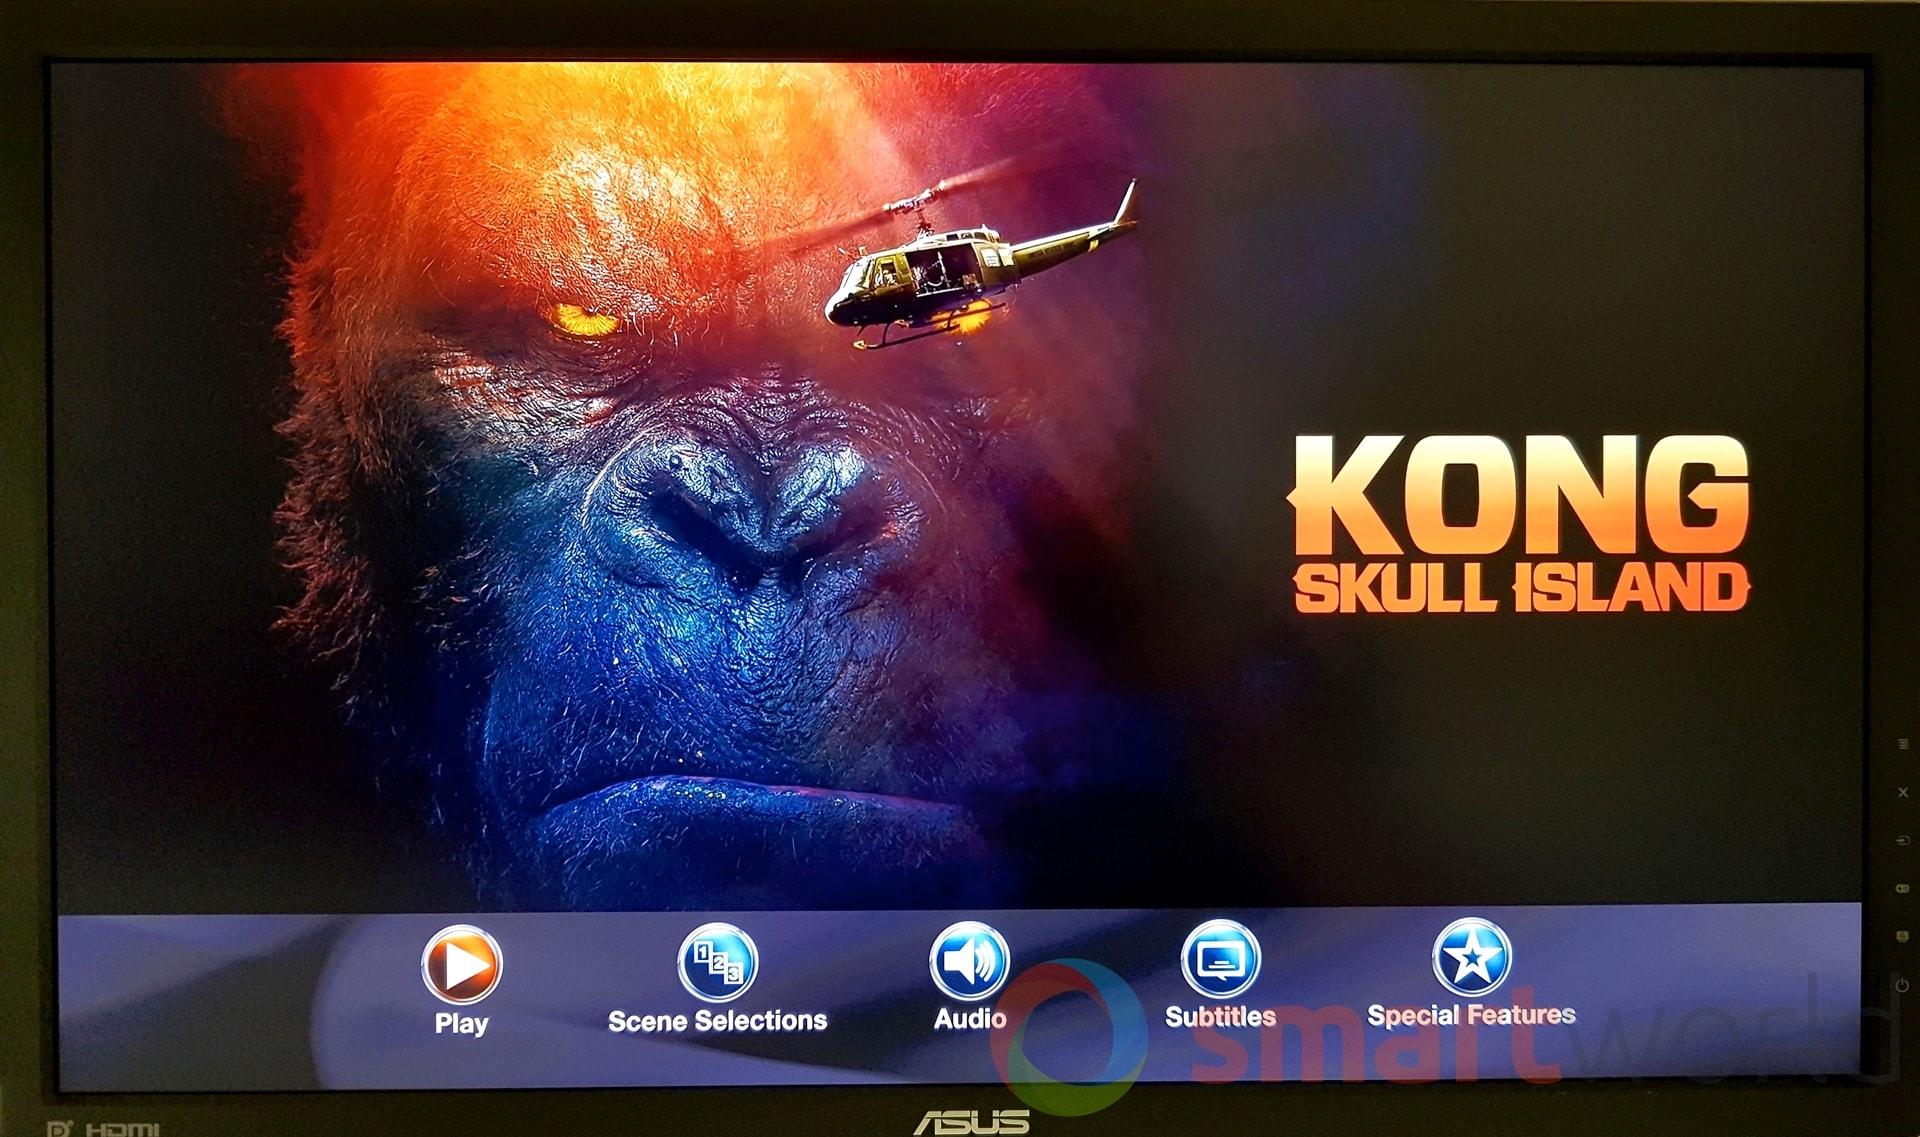 Kong Skull Island Recensione Blu-ray 4K – 11